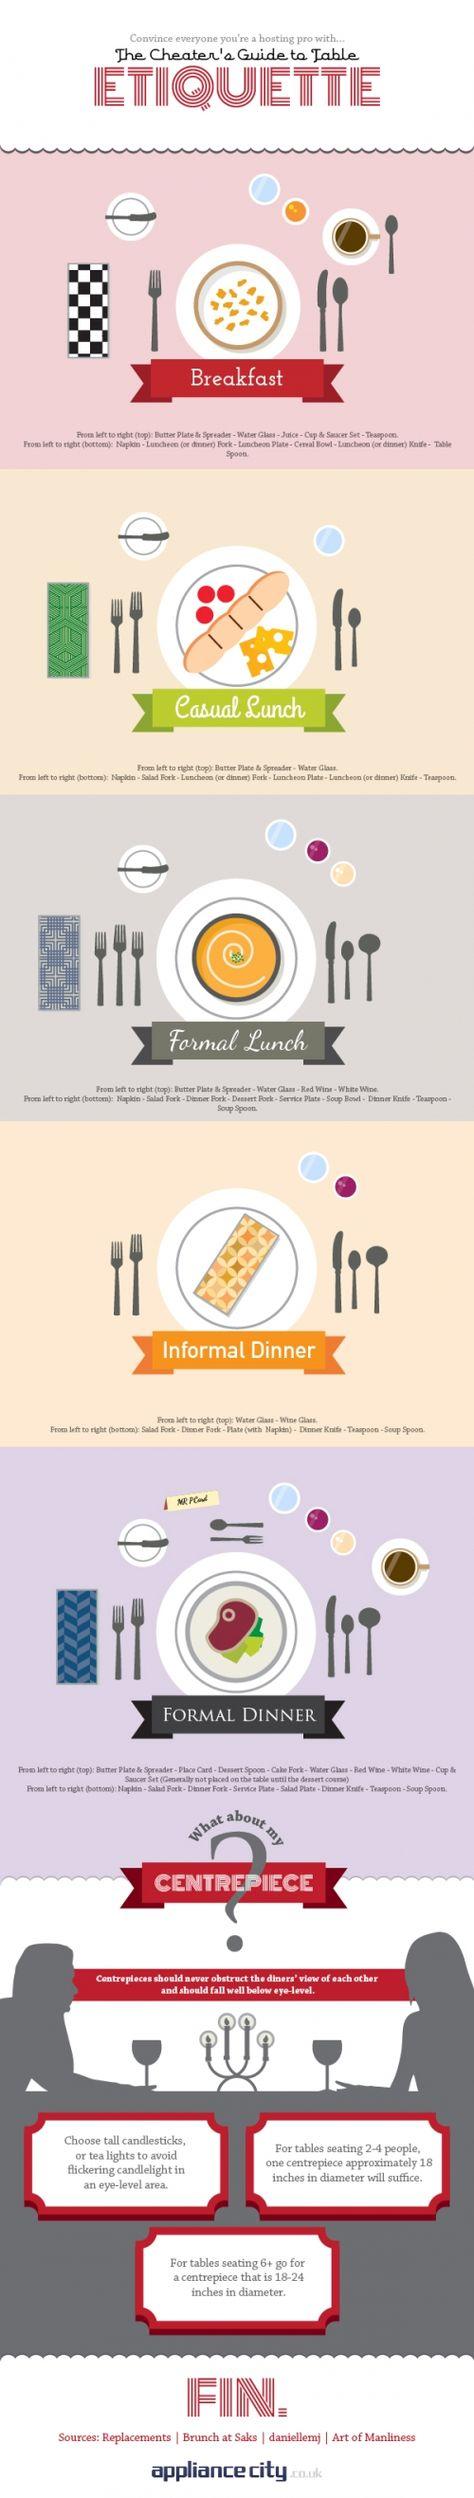 Formal dinner table setting etiquette - The 25 Best Table Etiquette Ideas On Pinterest Proper Table Setting Table Setting Etiquette And Table Setting Guides